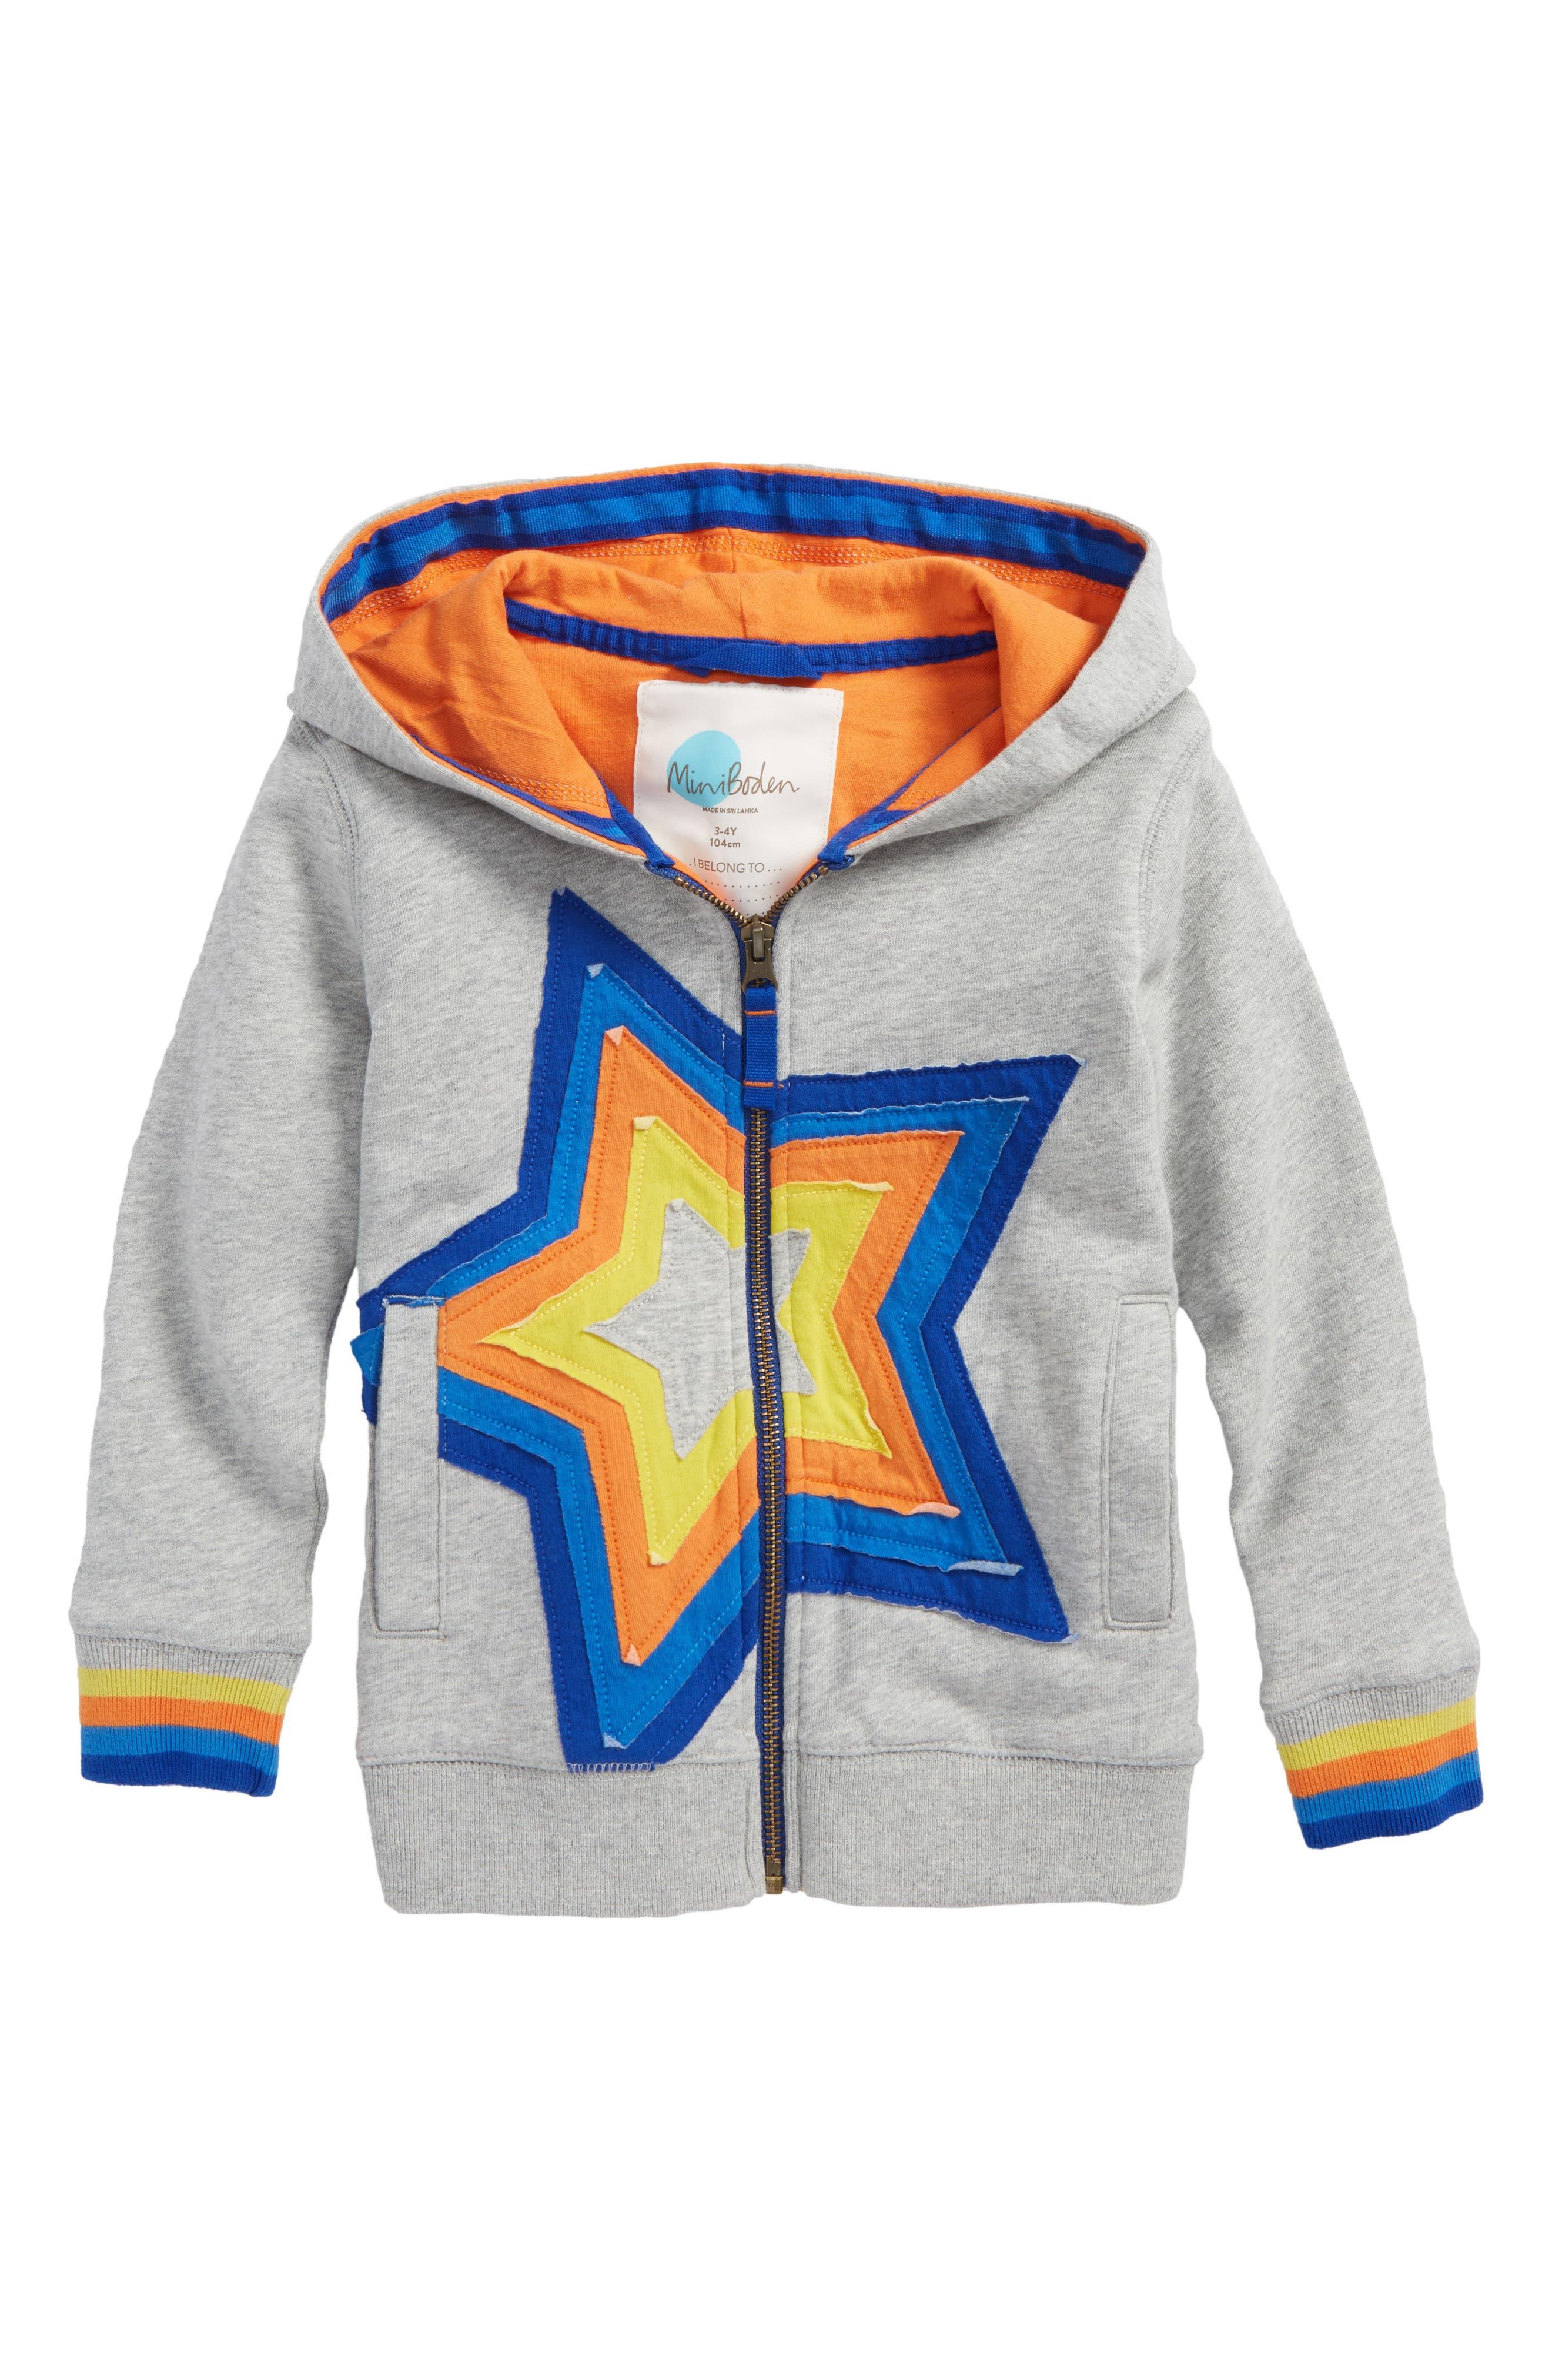 Main Image - Mini Boden Starry Zip Hoodie (Toddler Boys, Little Boys & Big Boys)